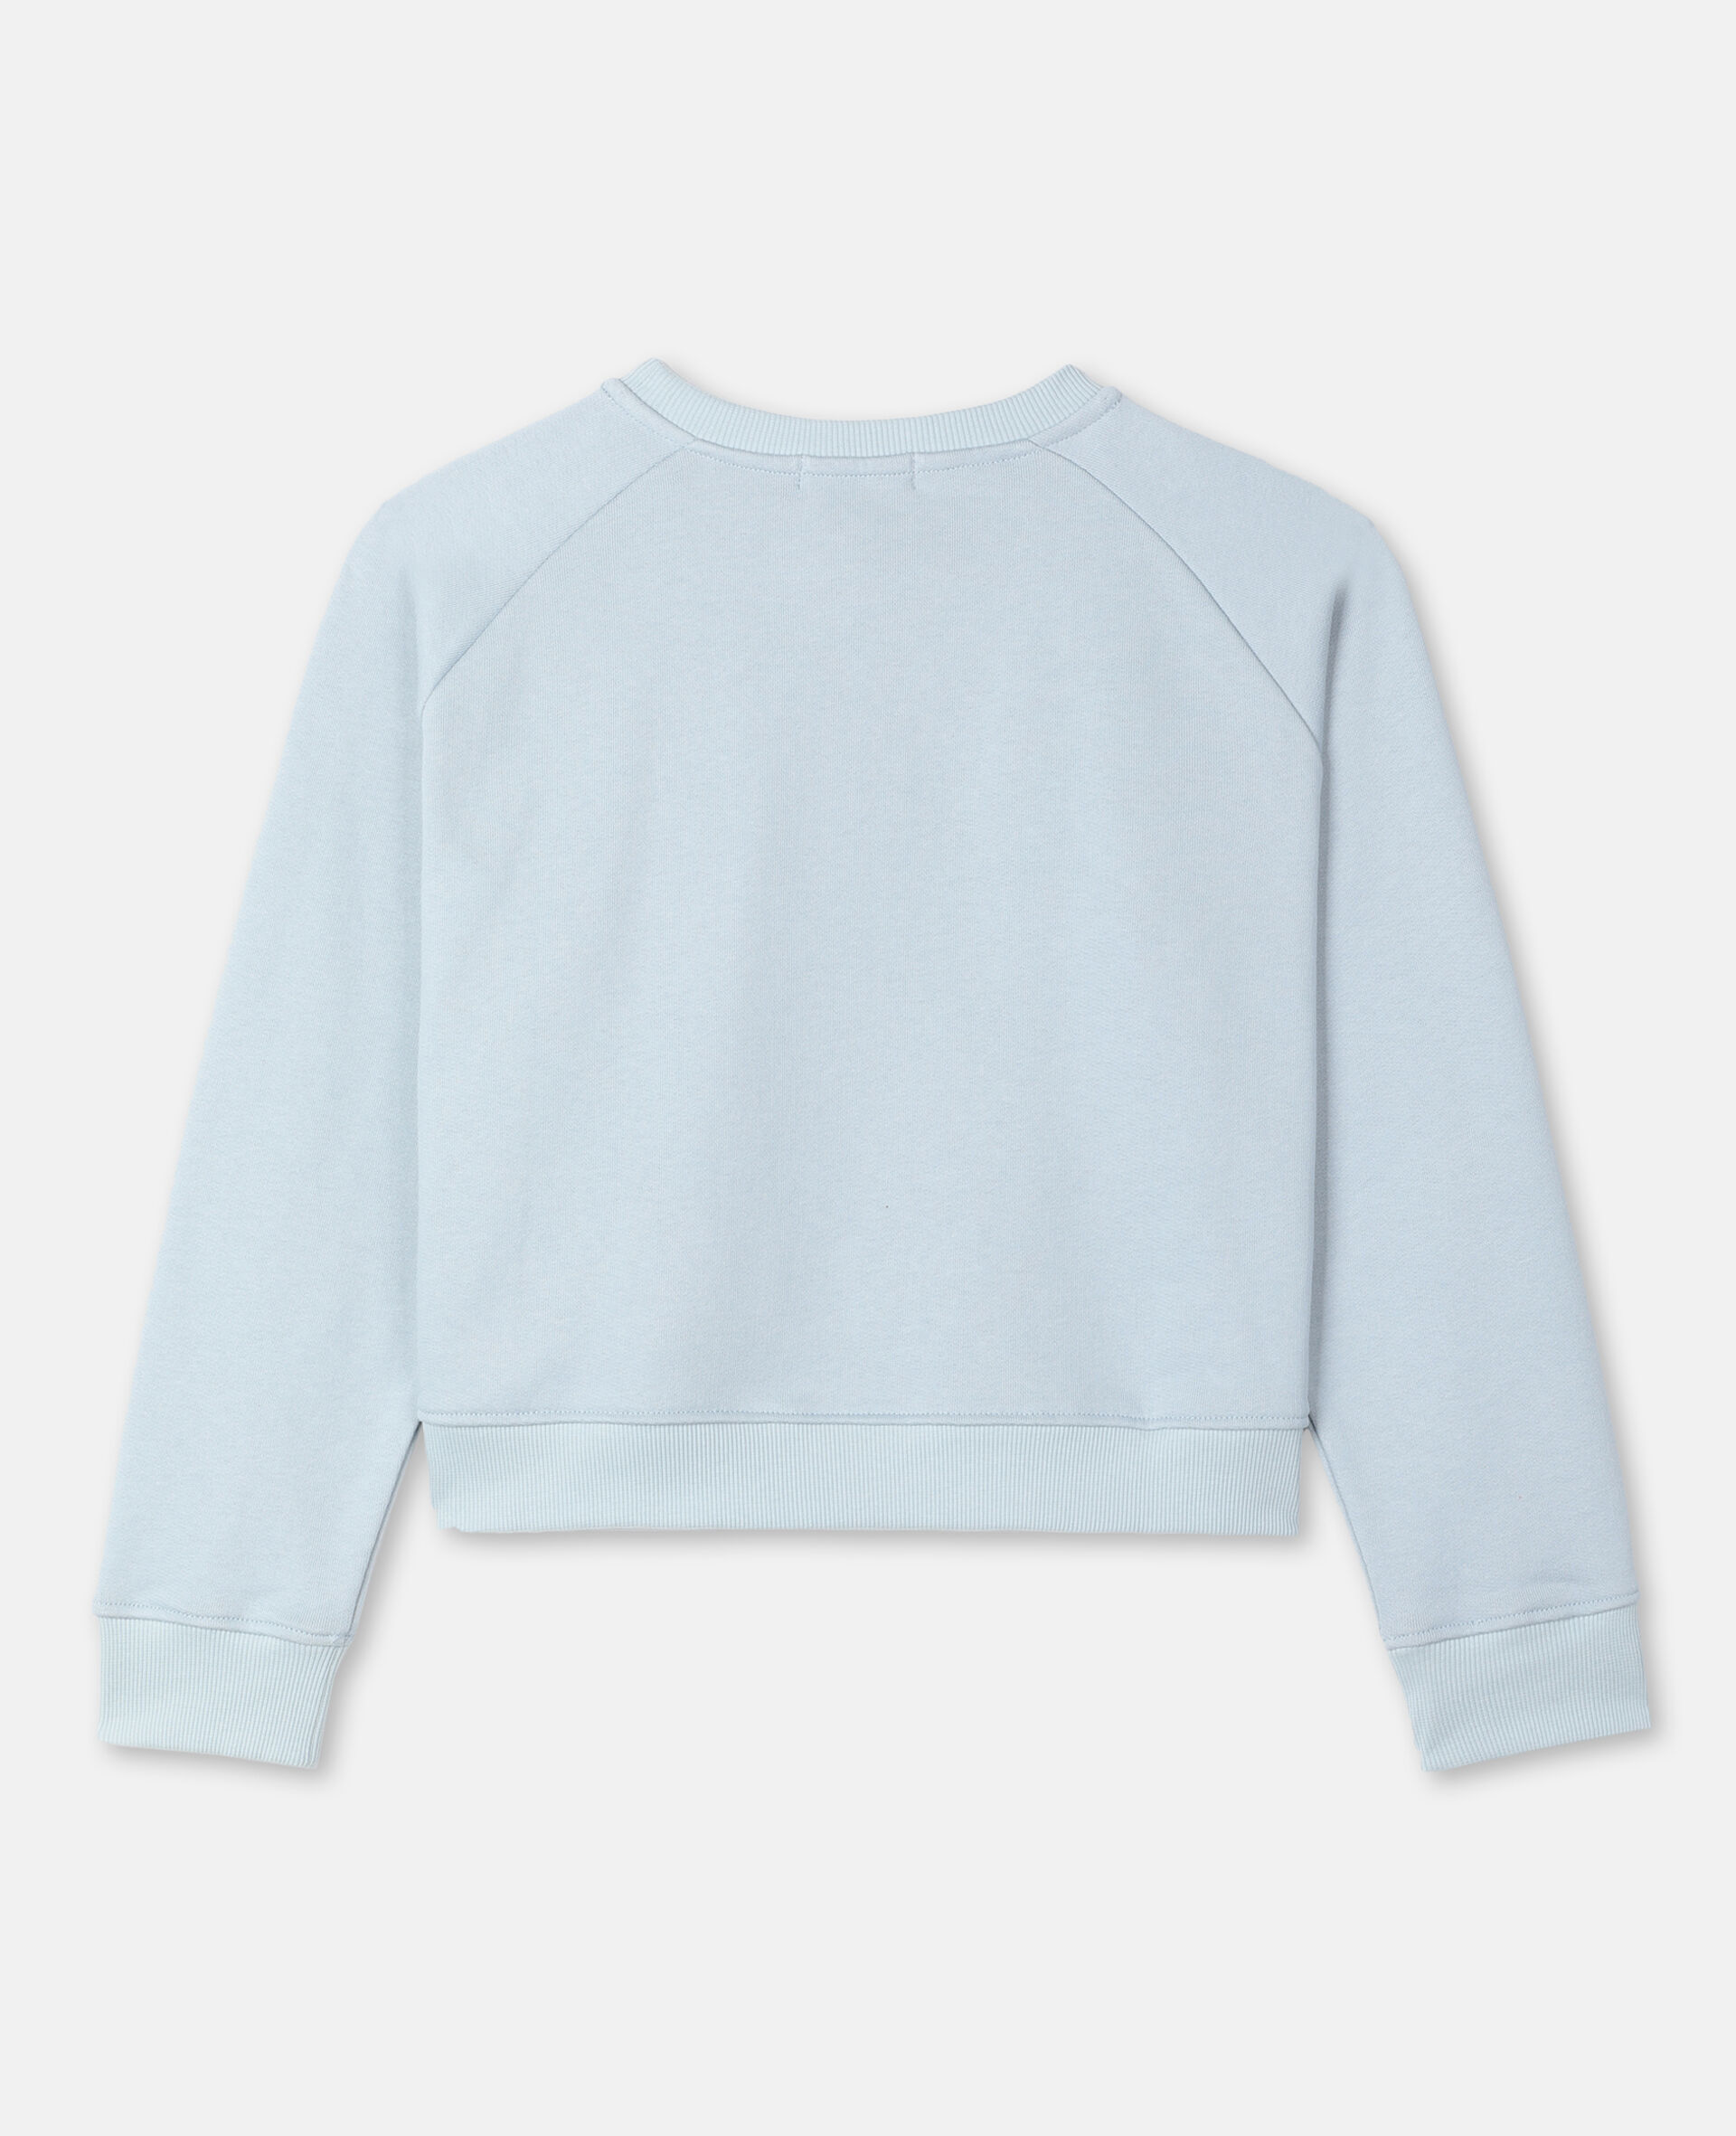 Painty Flamingo Cotton Fleece Sweatshirt -Blue-large image number 3